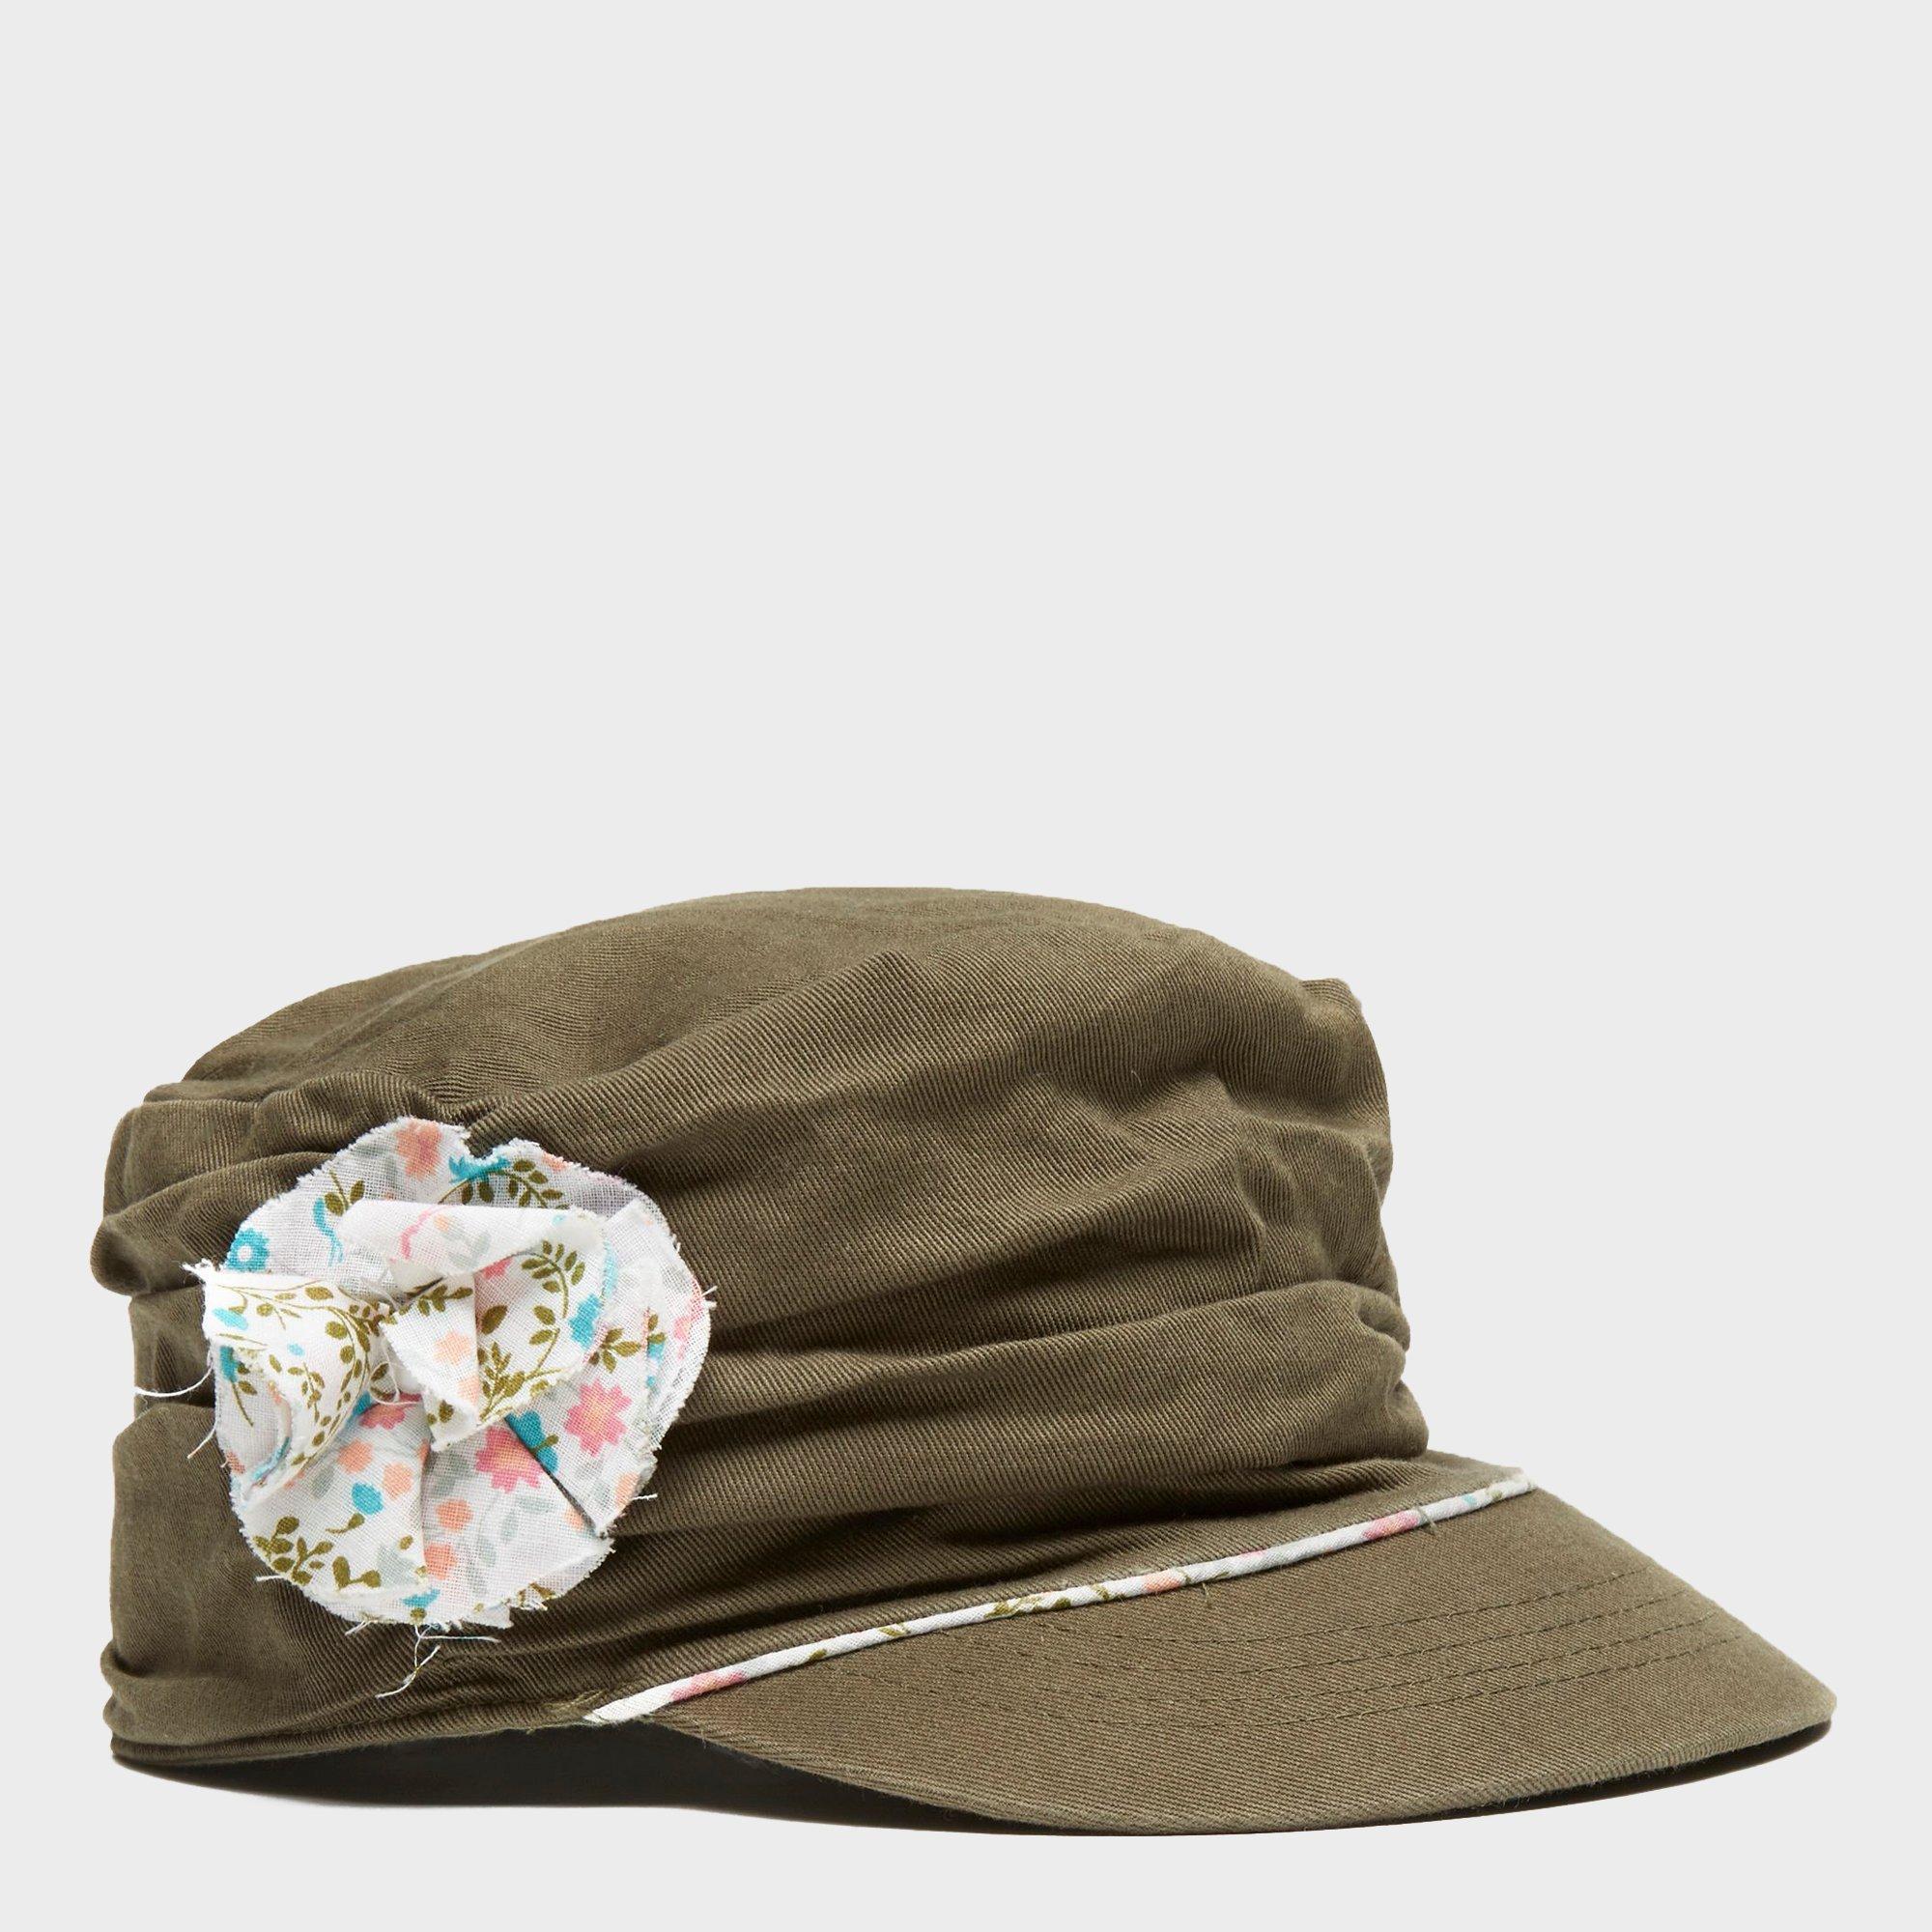 Peter Storm Girls Chrissy Castro Hat Khaki